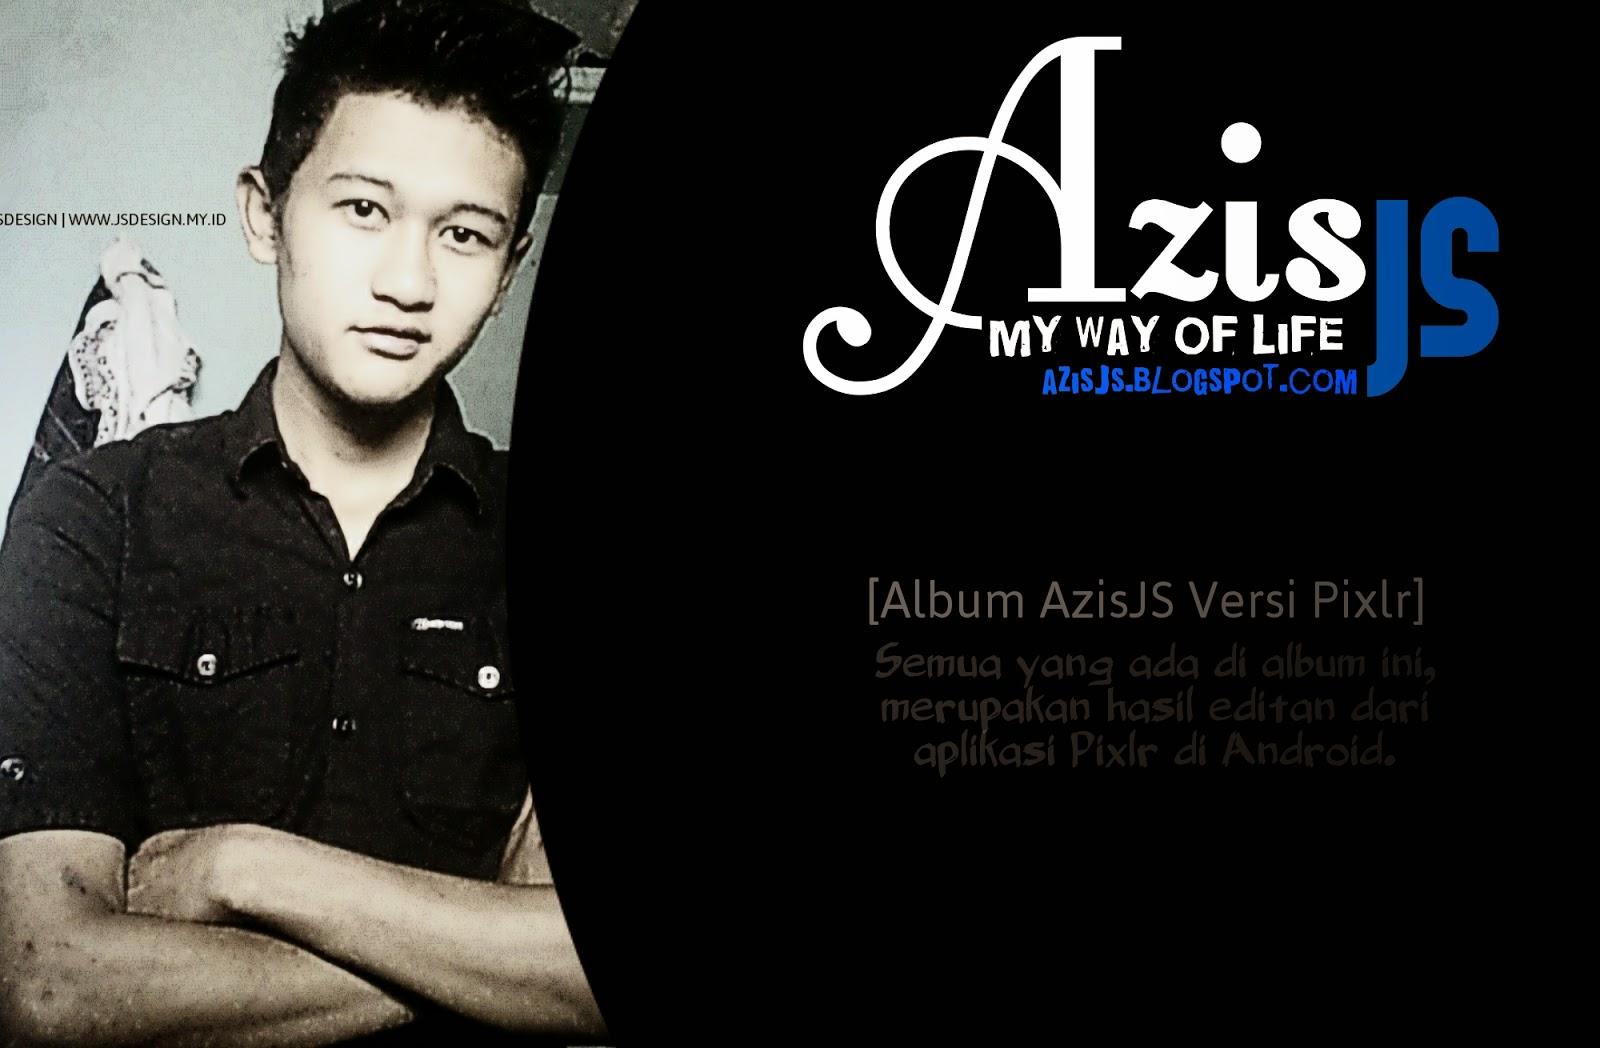 Album AzisJS | Versi Pixlr 2015